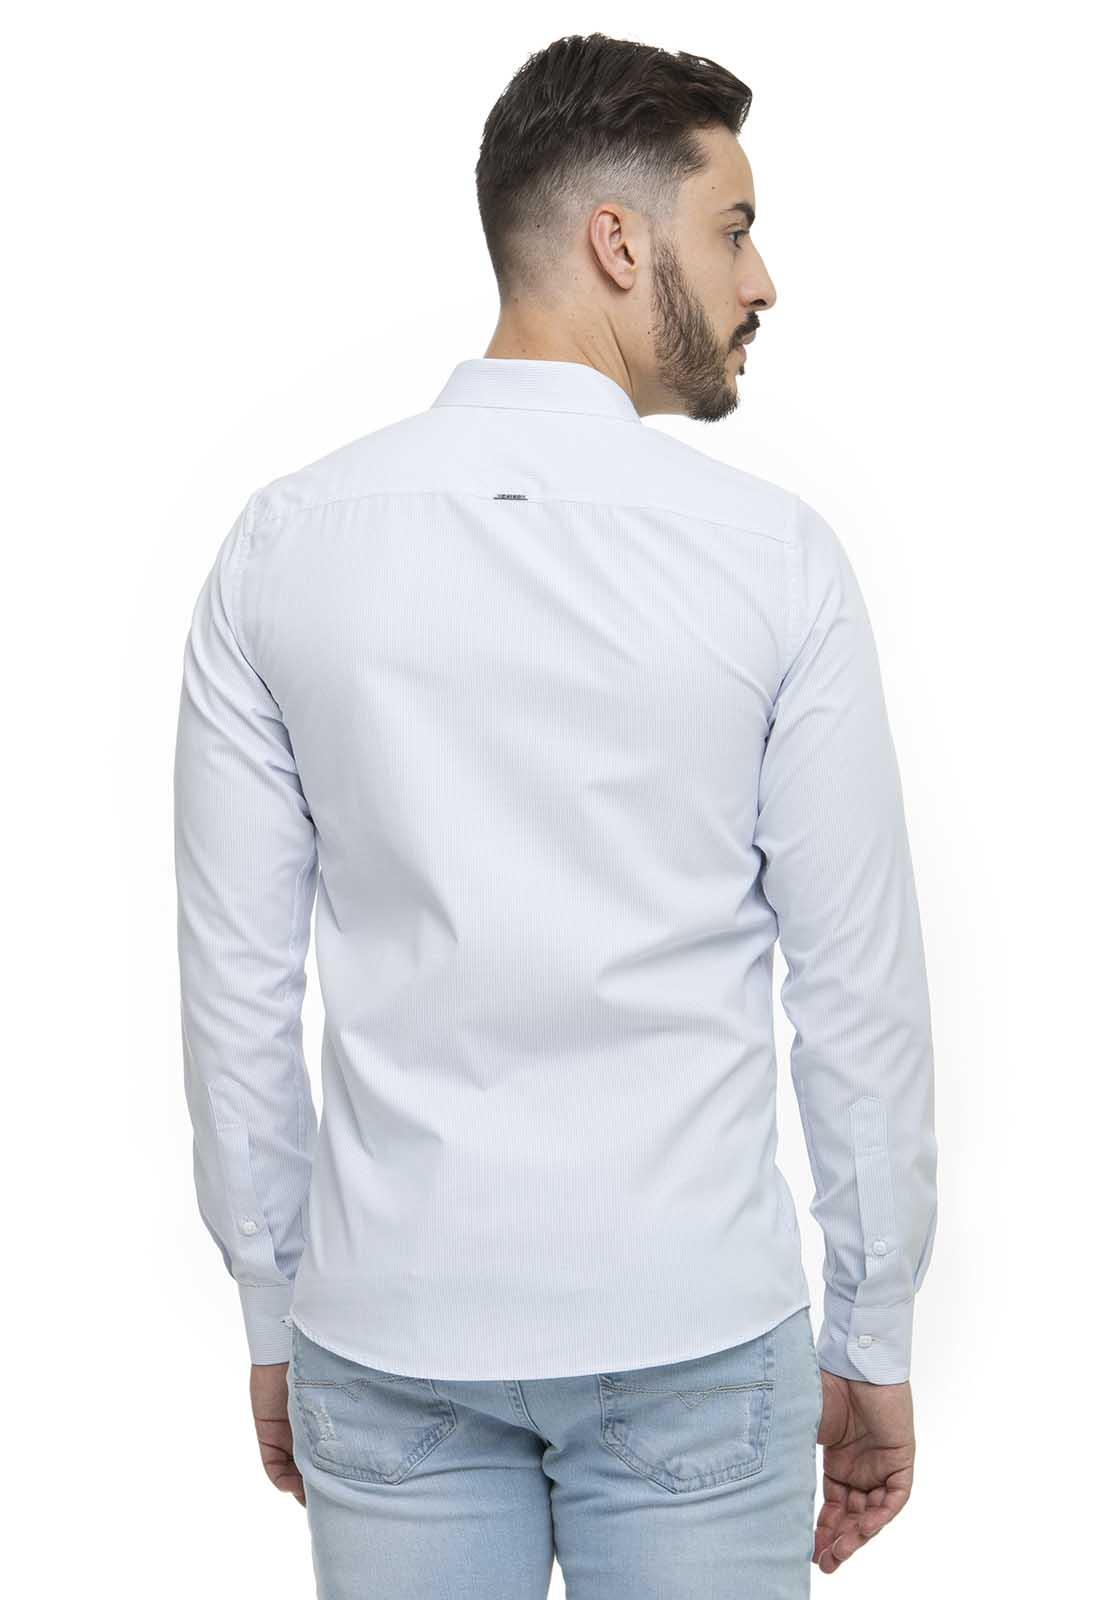 Camisa Fit Zaiko Micro Xadrez Manga Longa 2320